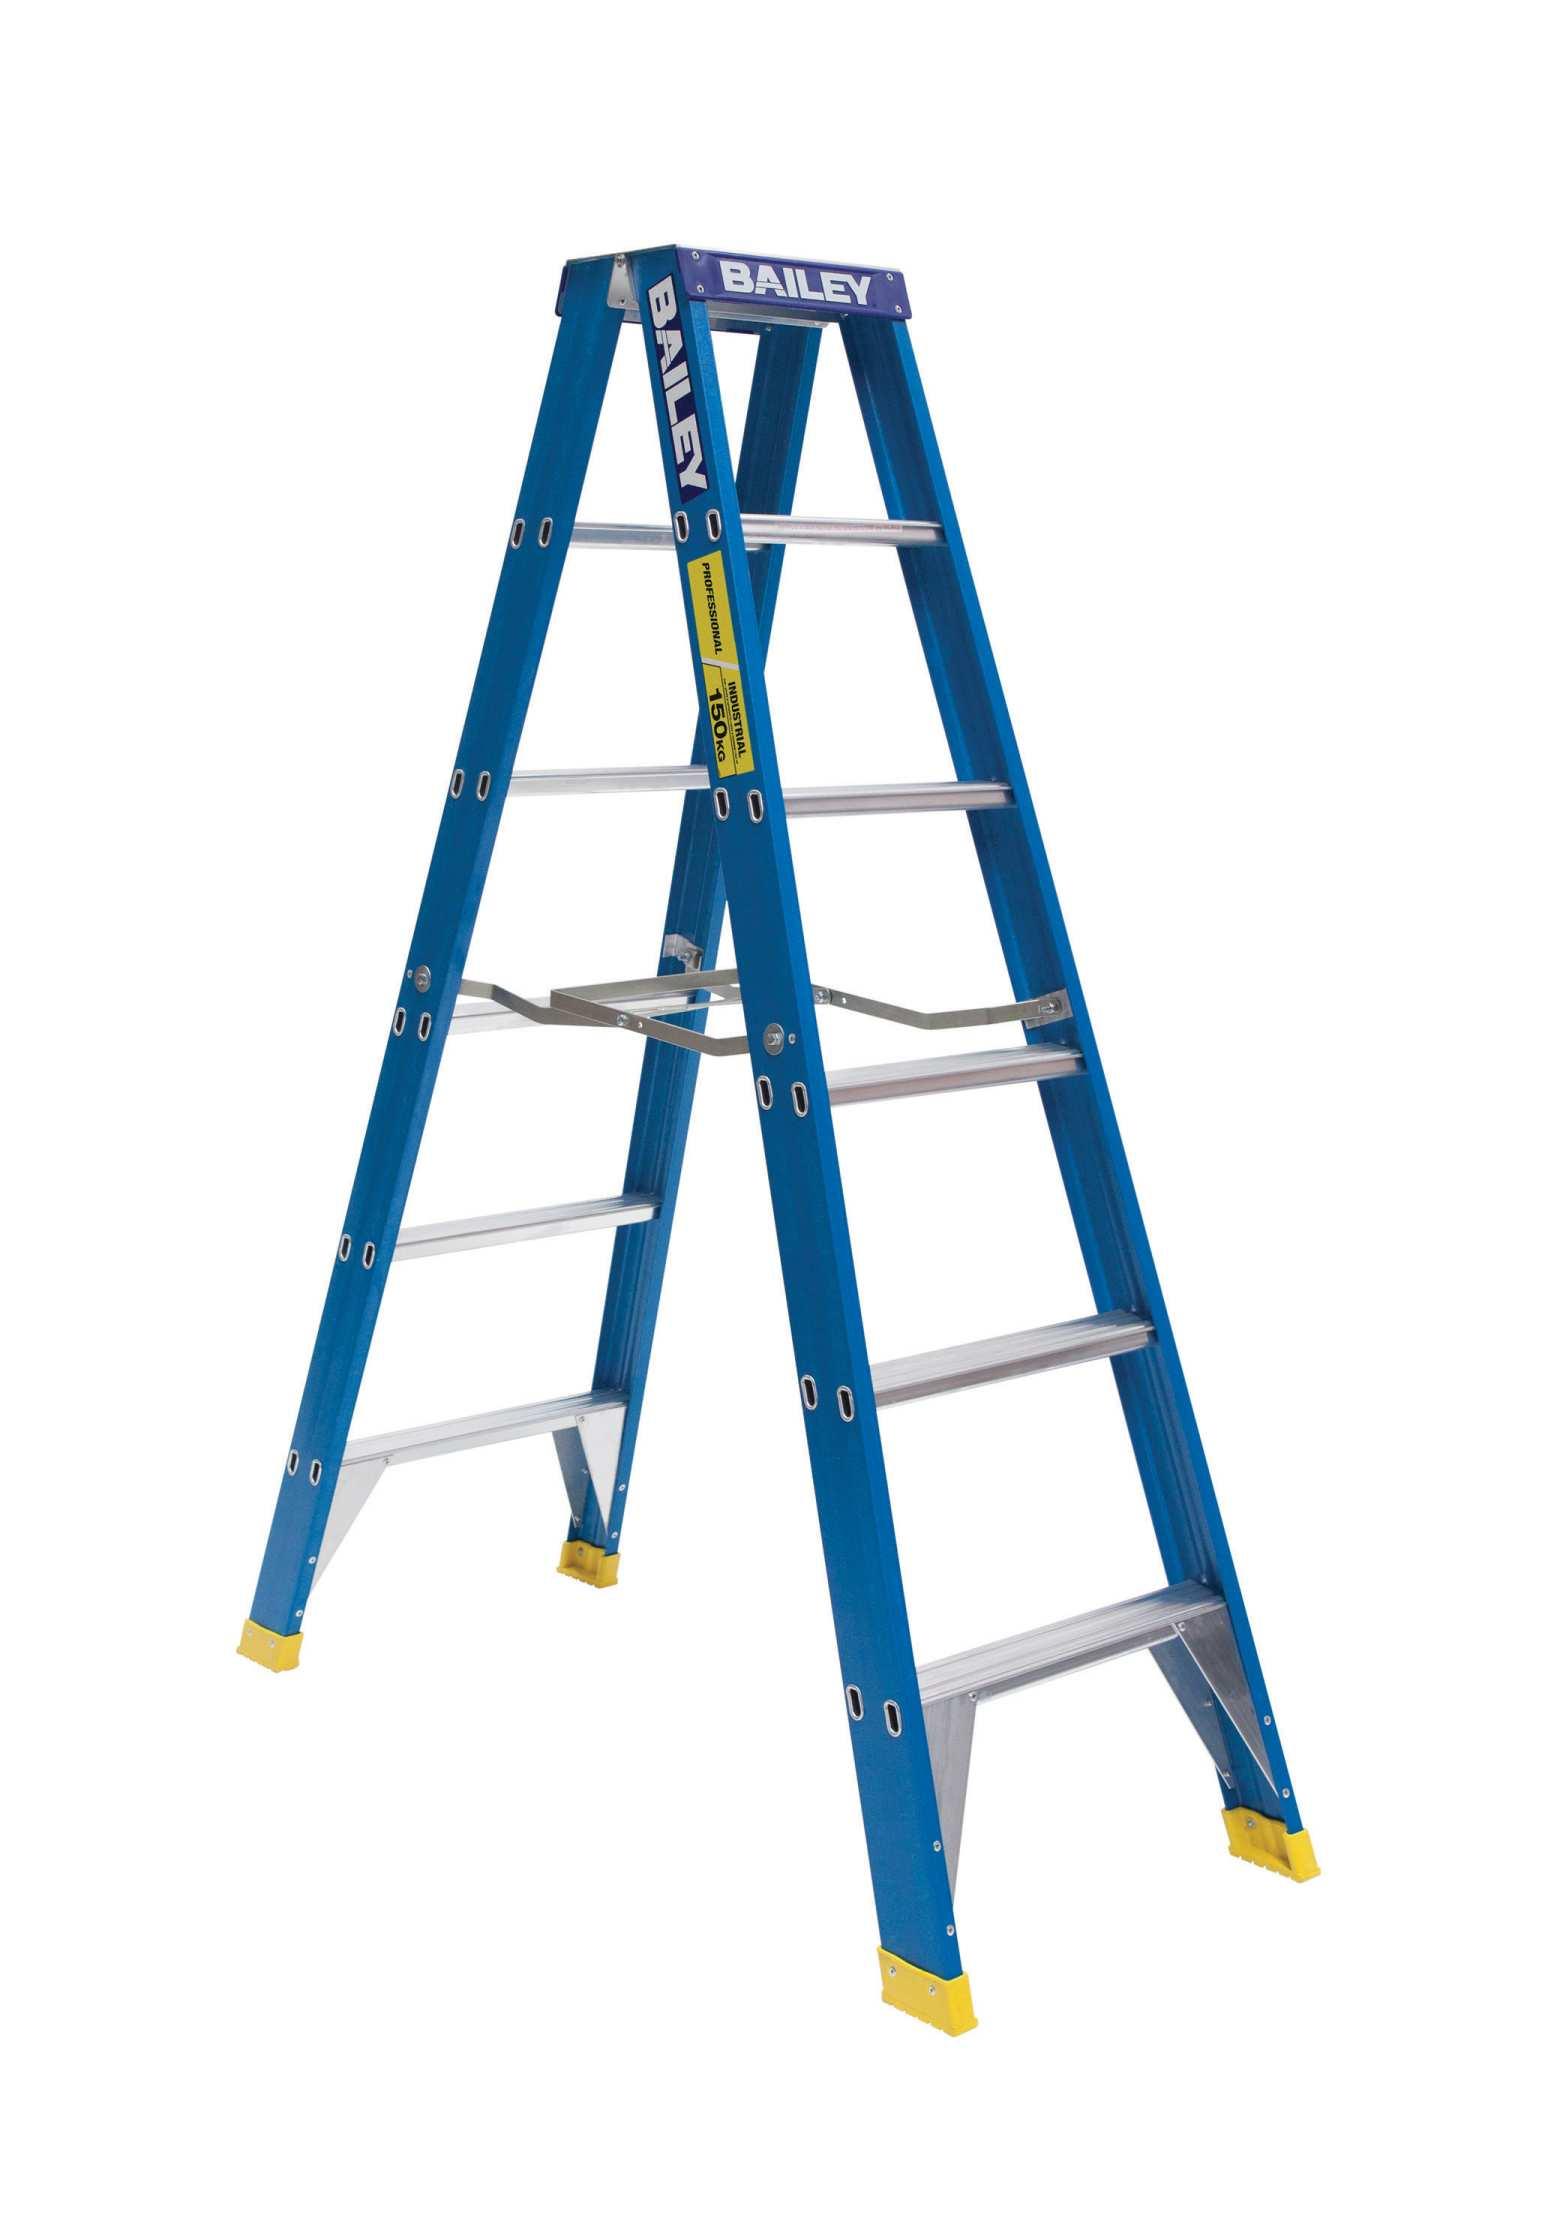 Buy Bailey Rfds 6 6ft 1 8m Ladder Fibreglass Load